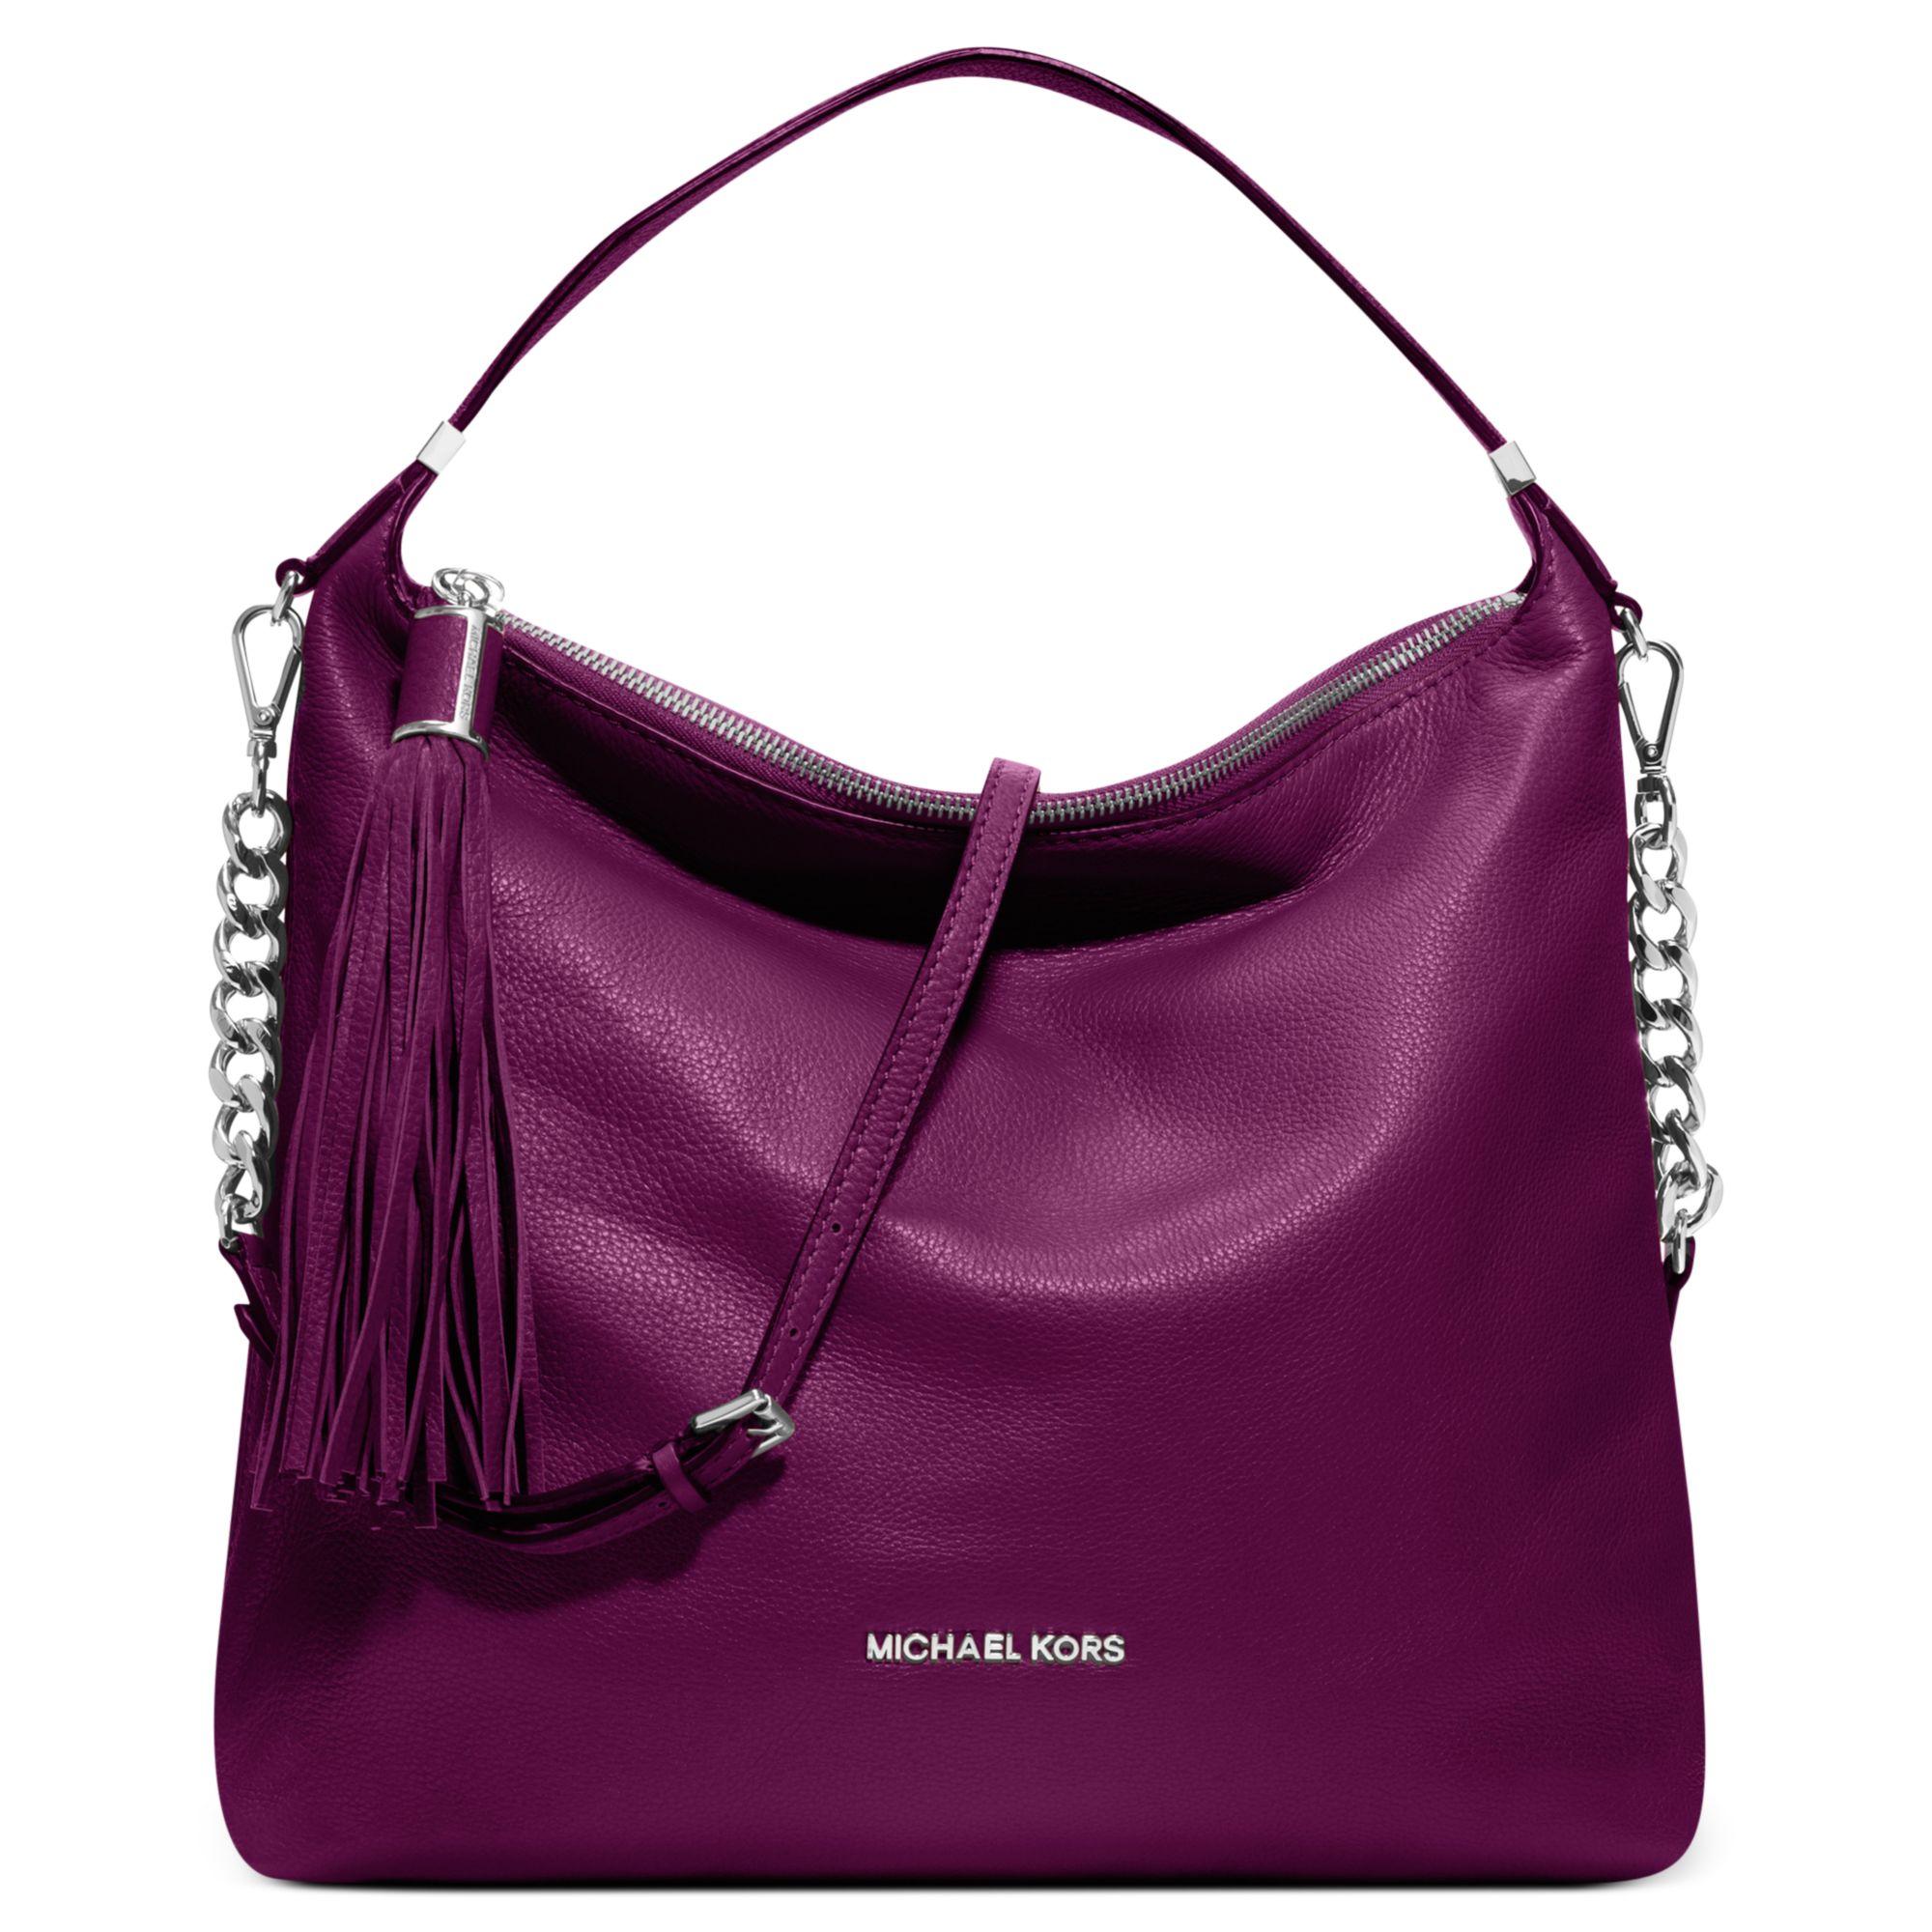 Michael Kors Weston Large Shoulder Bag in Purple (Pomegranate)